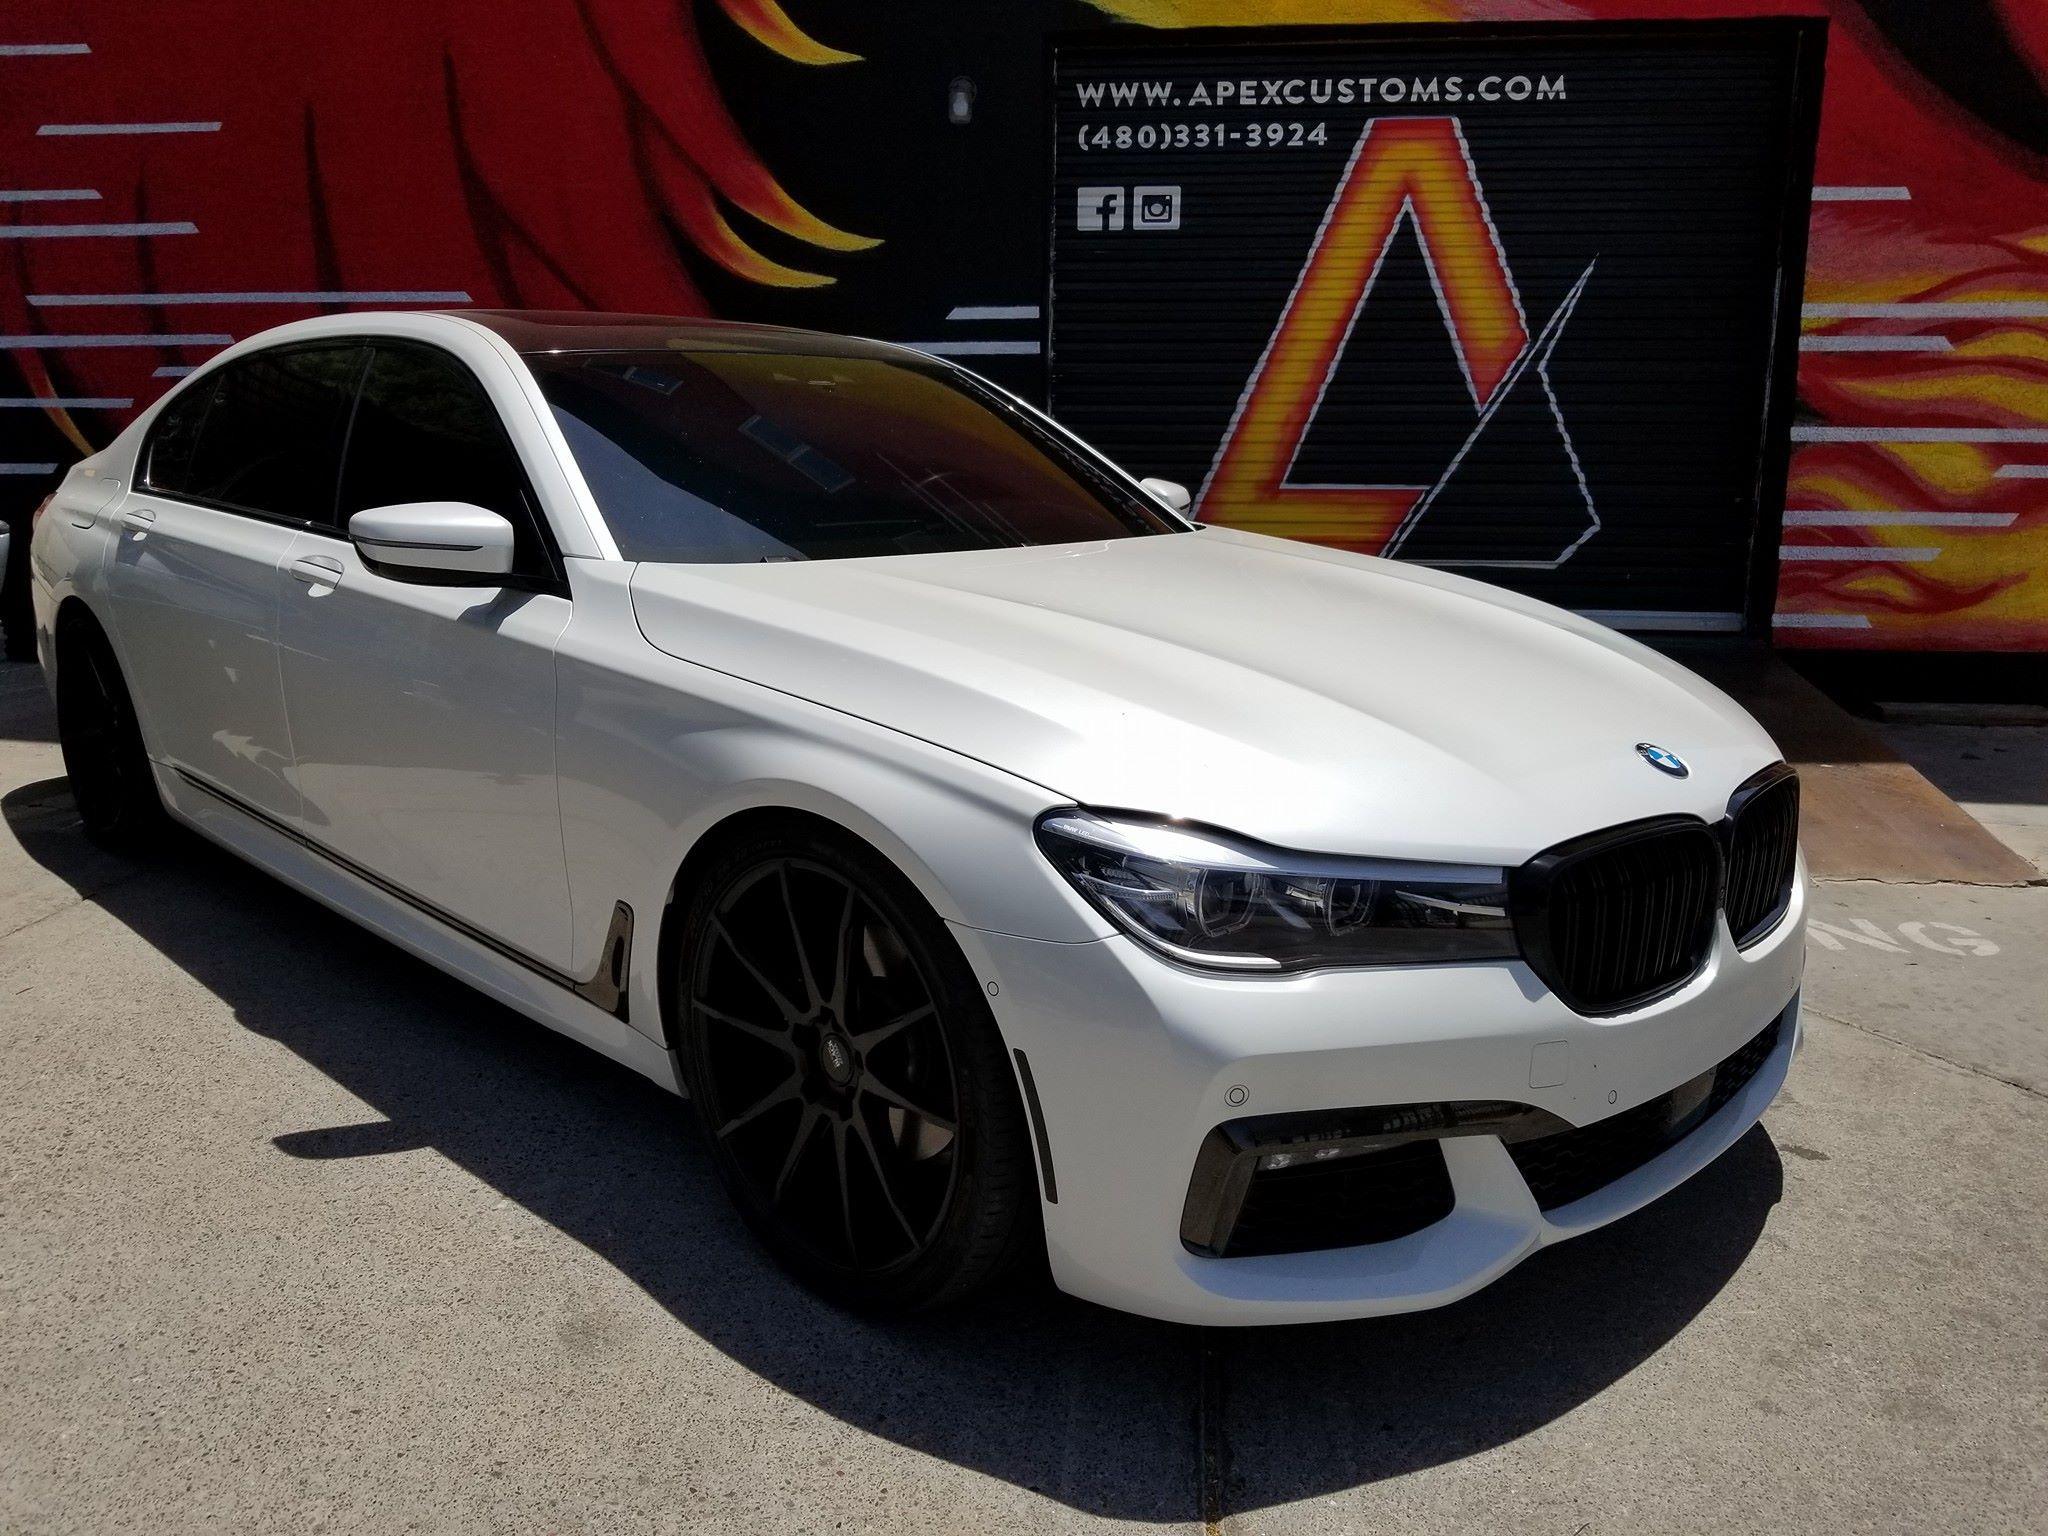 2016 BMW 7 Series Ghost Link Lowering Kit Installed Drops